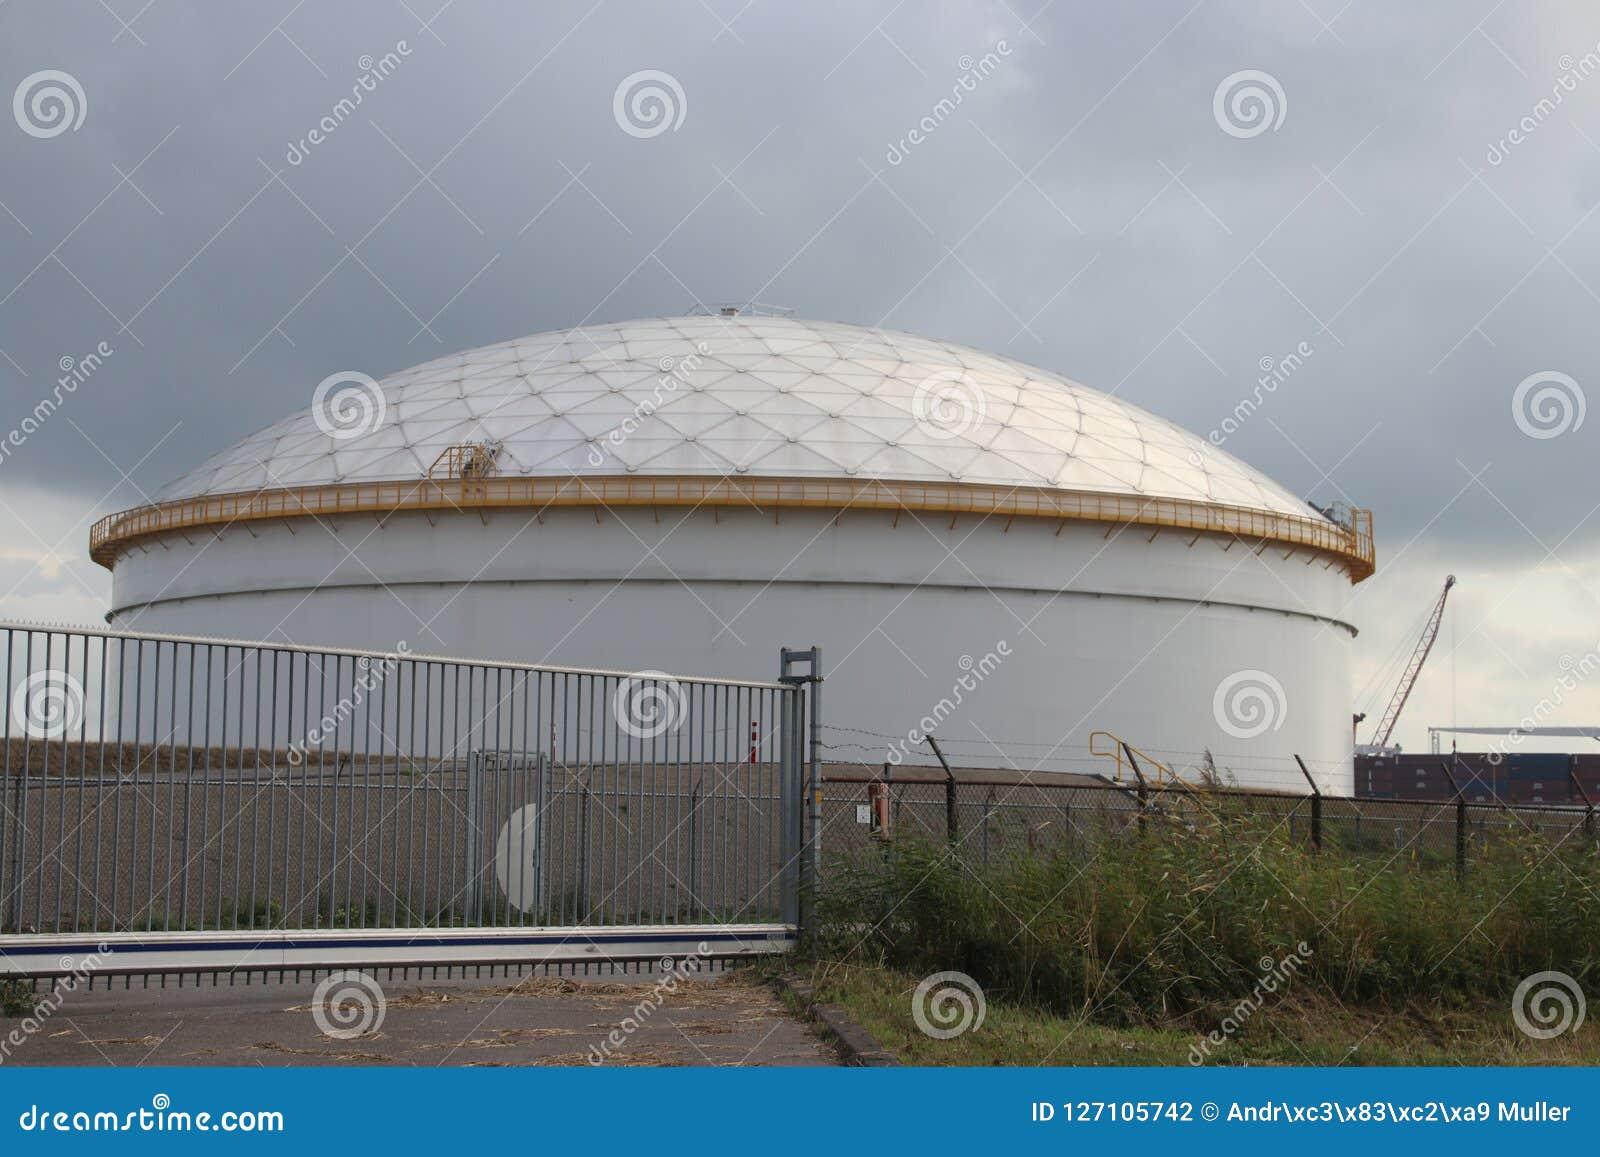 Opslagtank bij raffinaderij in Rotterdam om olie van brandstof in Nederland op te slaan